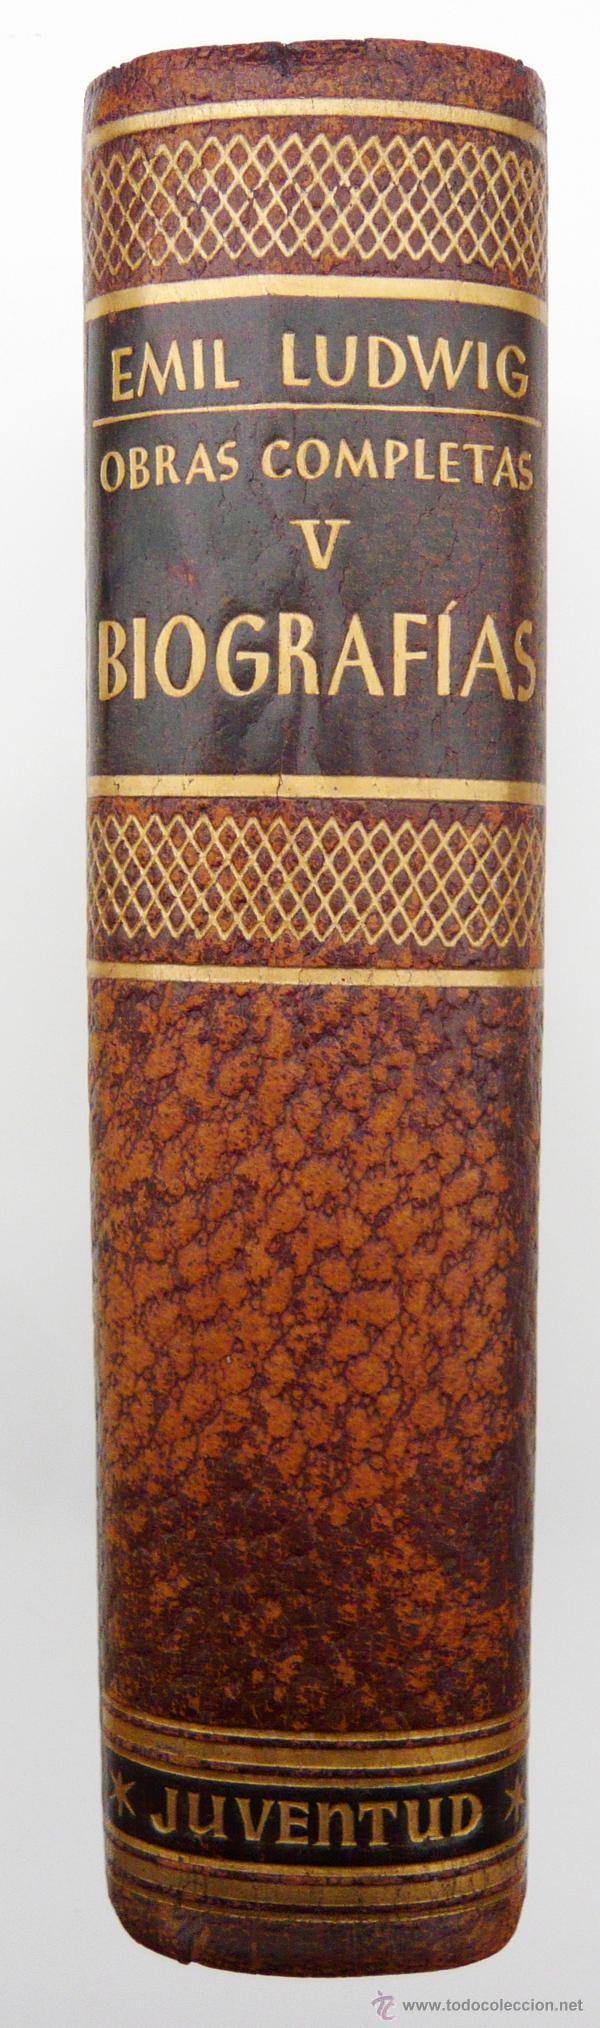 Libros de segunda mano: OBRAS COMPLETAS / E. LUDWIG/ ED. JUVENTUD 1957/ 1ª EDICION / PIEL / BIOGRAFIAS / VOLUMEN V - Foto 2 - 43562213